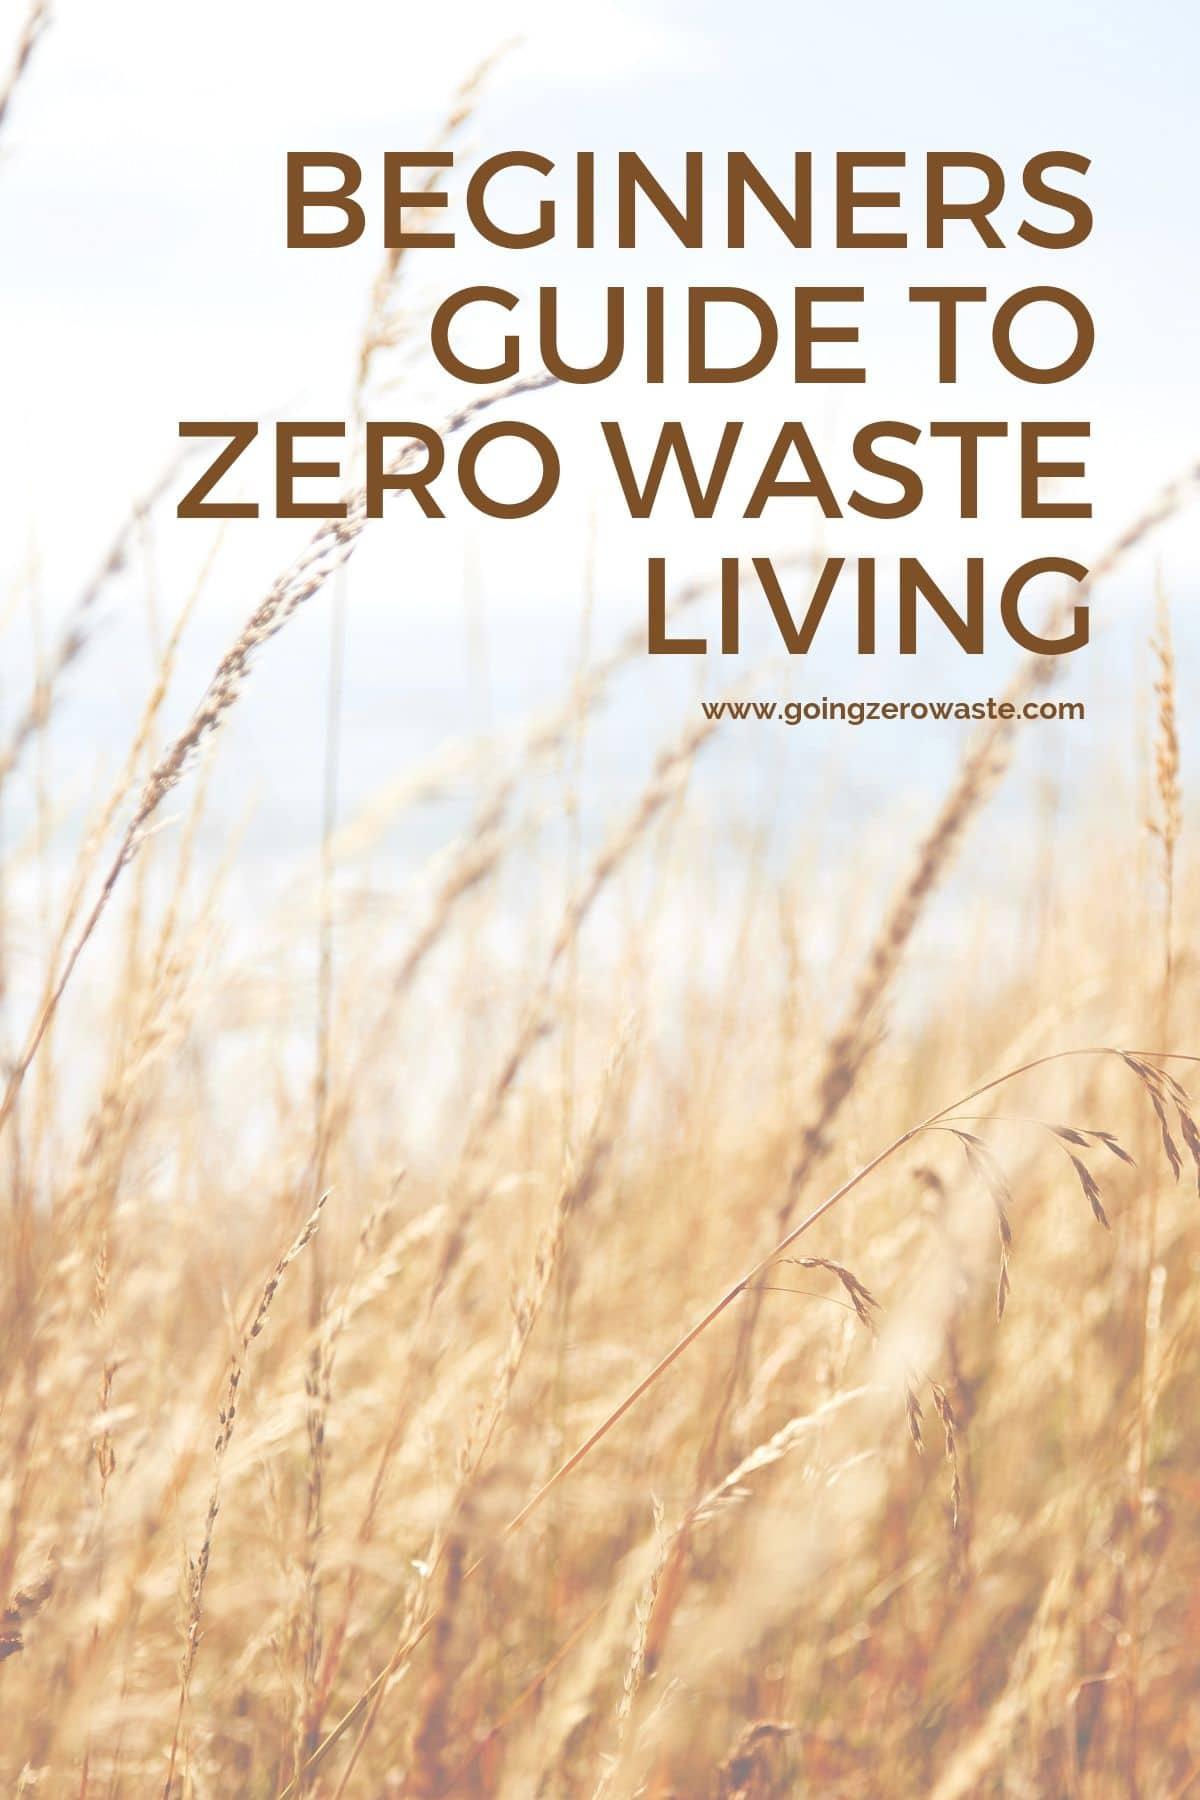 Four Tips for Starting a Zero Waste Lifestyle